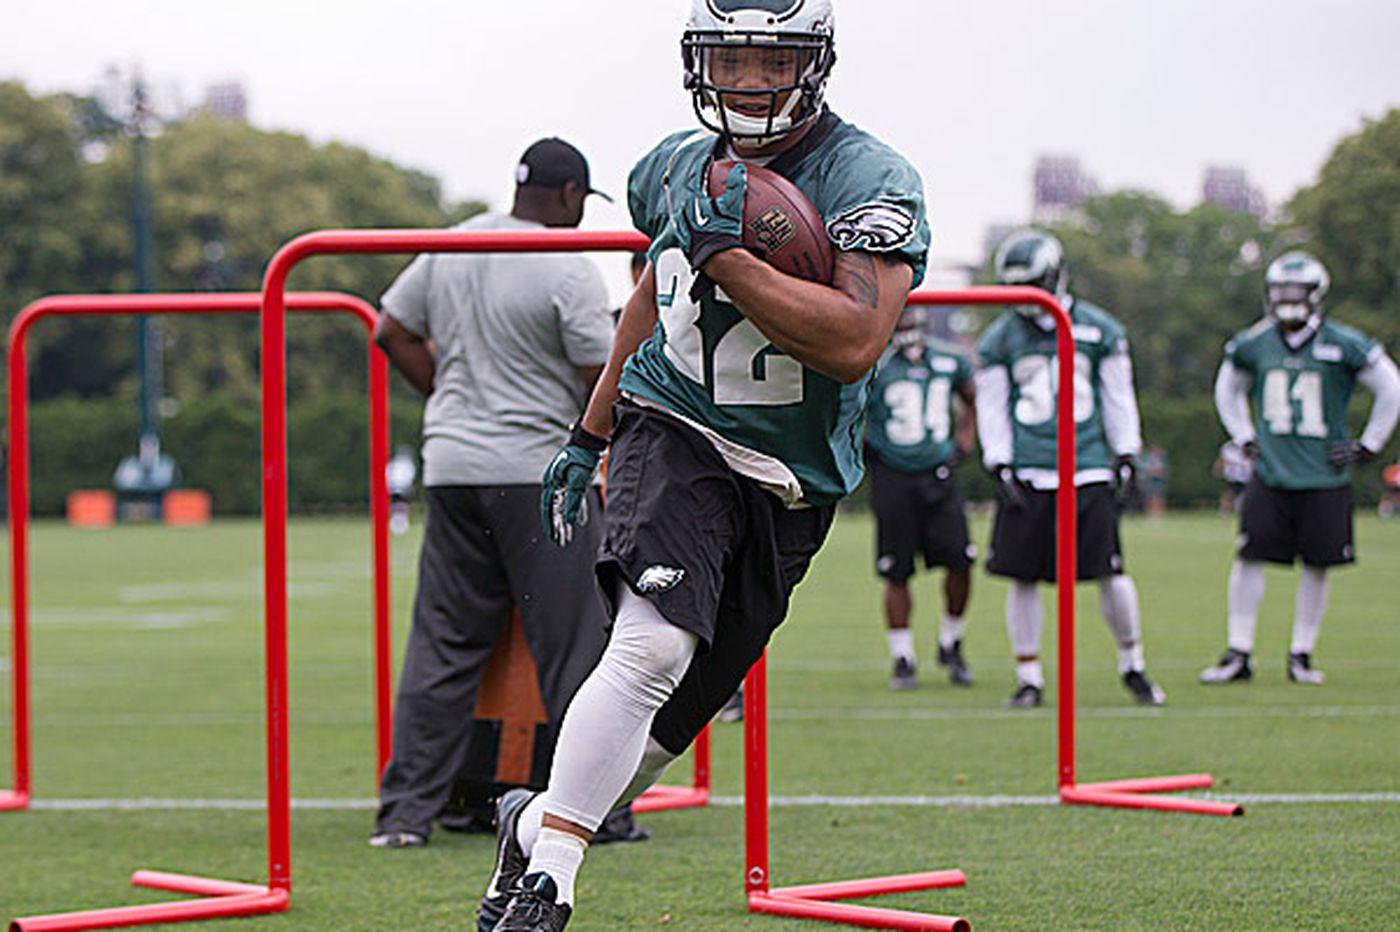 Eagles Notes: Injured Polk still has an eye on Eagles roster spot